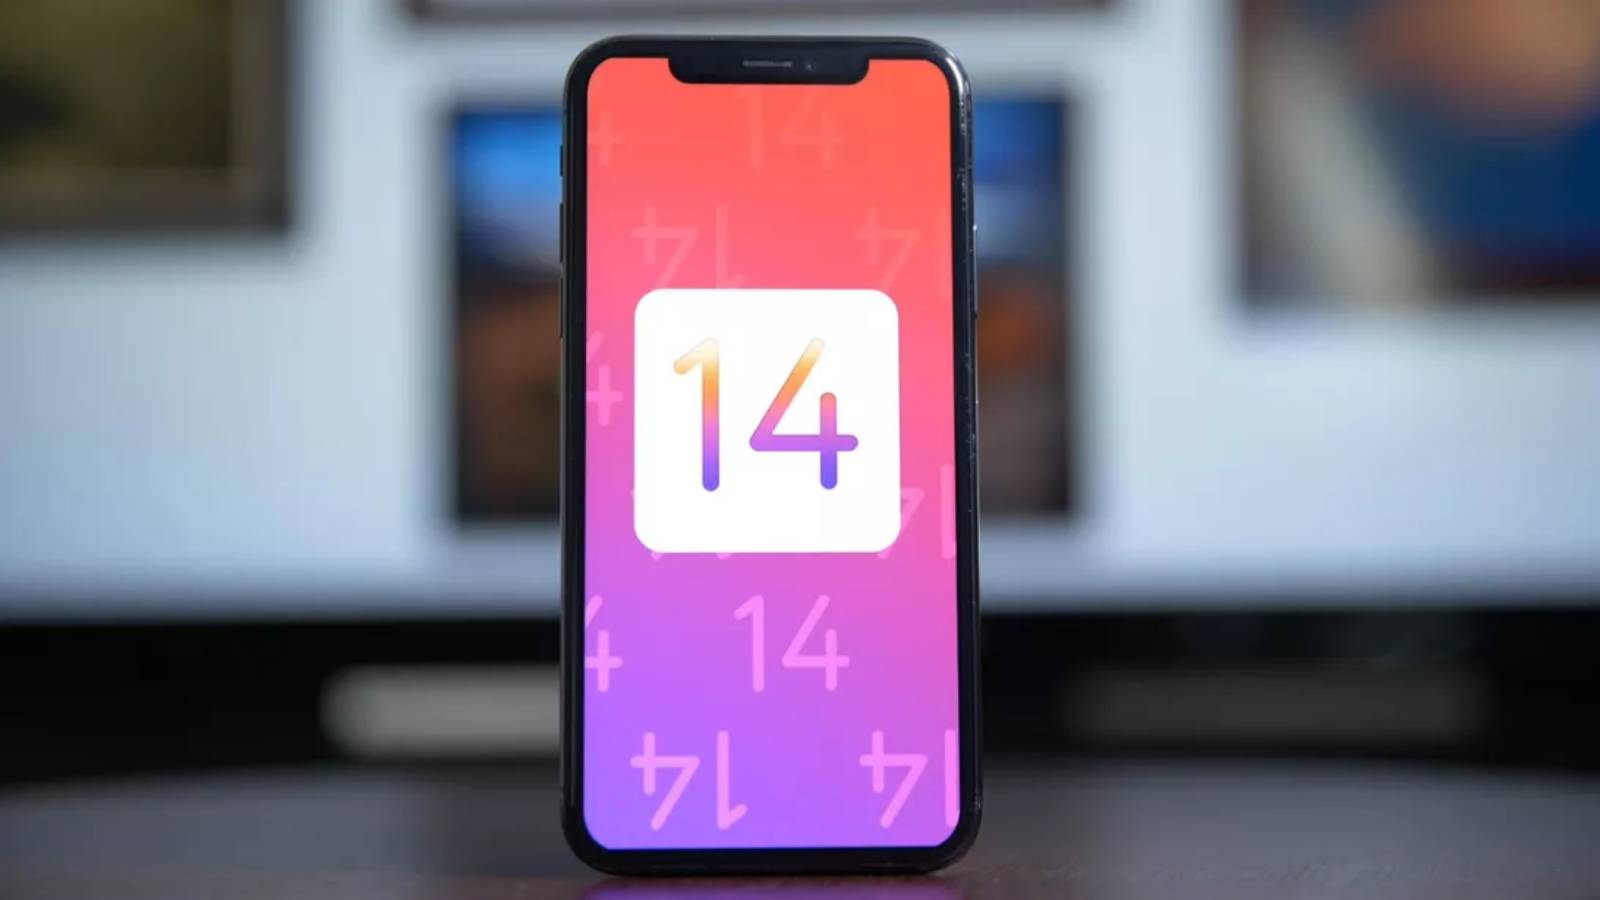 iOS 14.2 autonomie